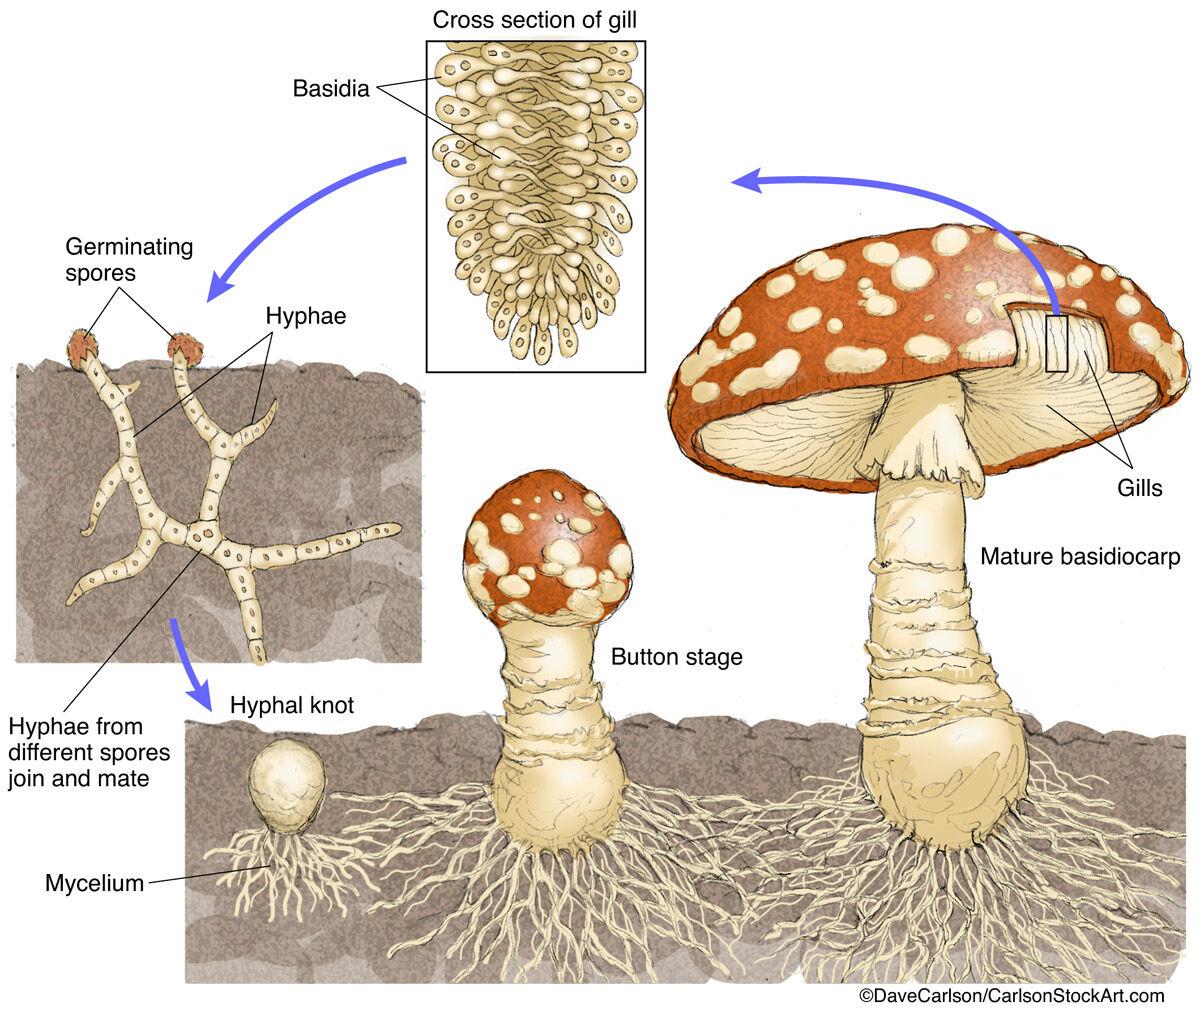 illustration, structure, life cycle, mushroom, fungus, photo